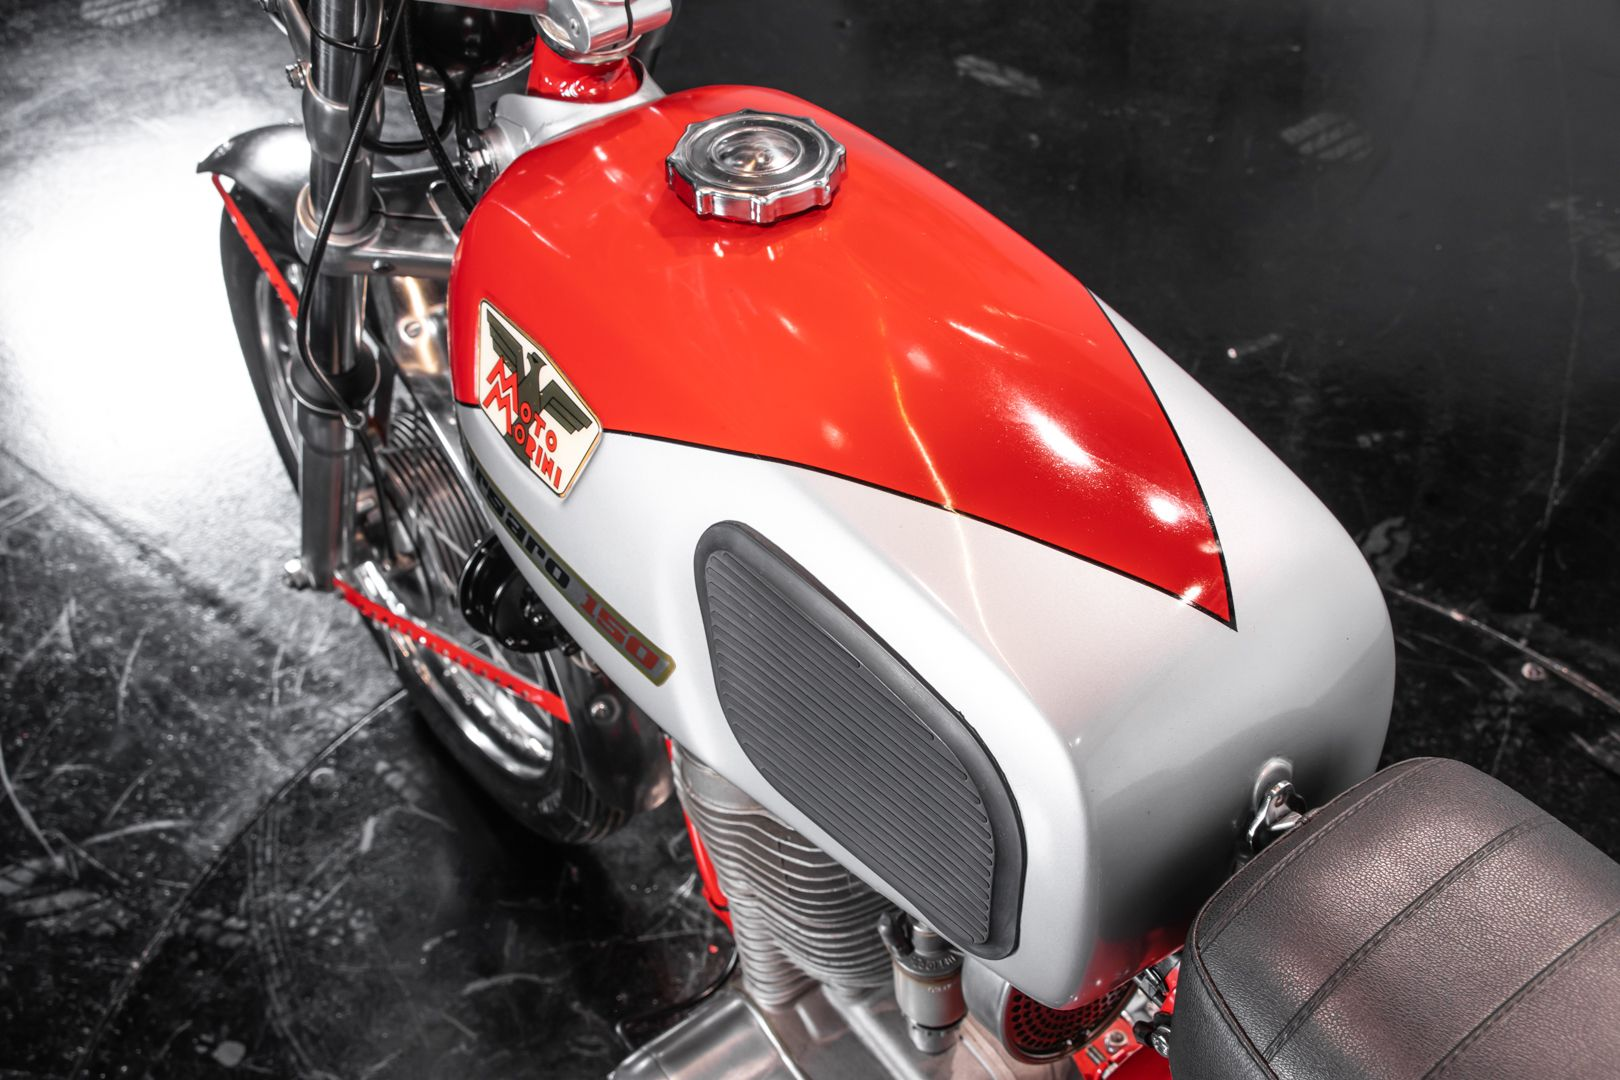 1971 Moto Morini Corsaro SS 150 77732